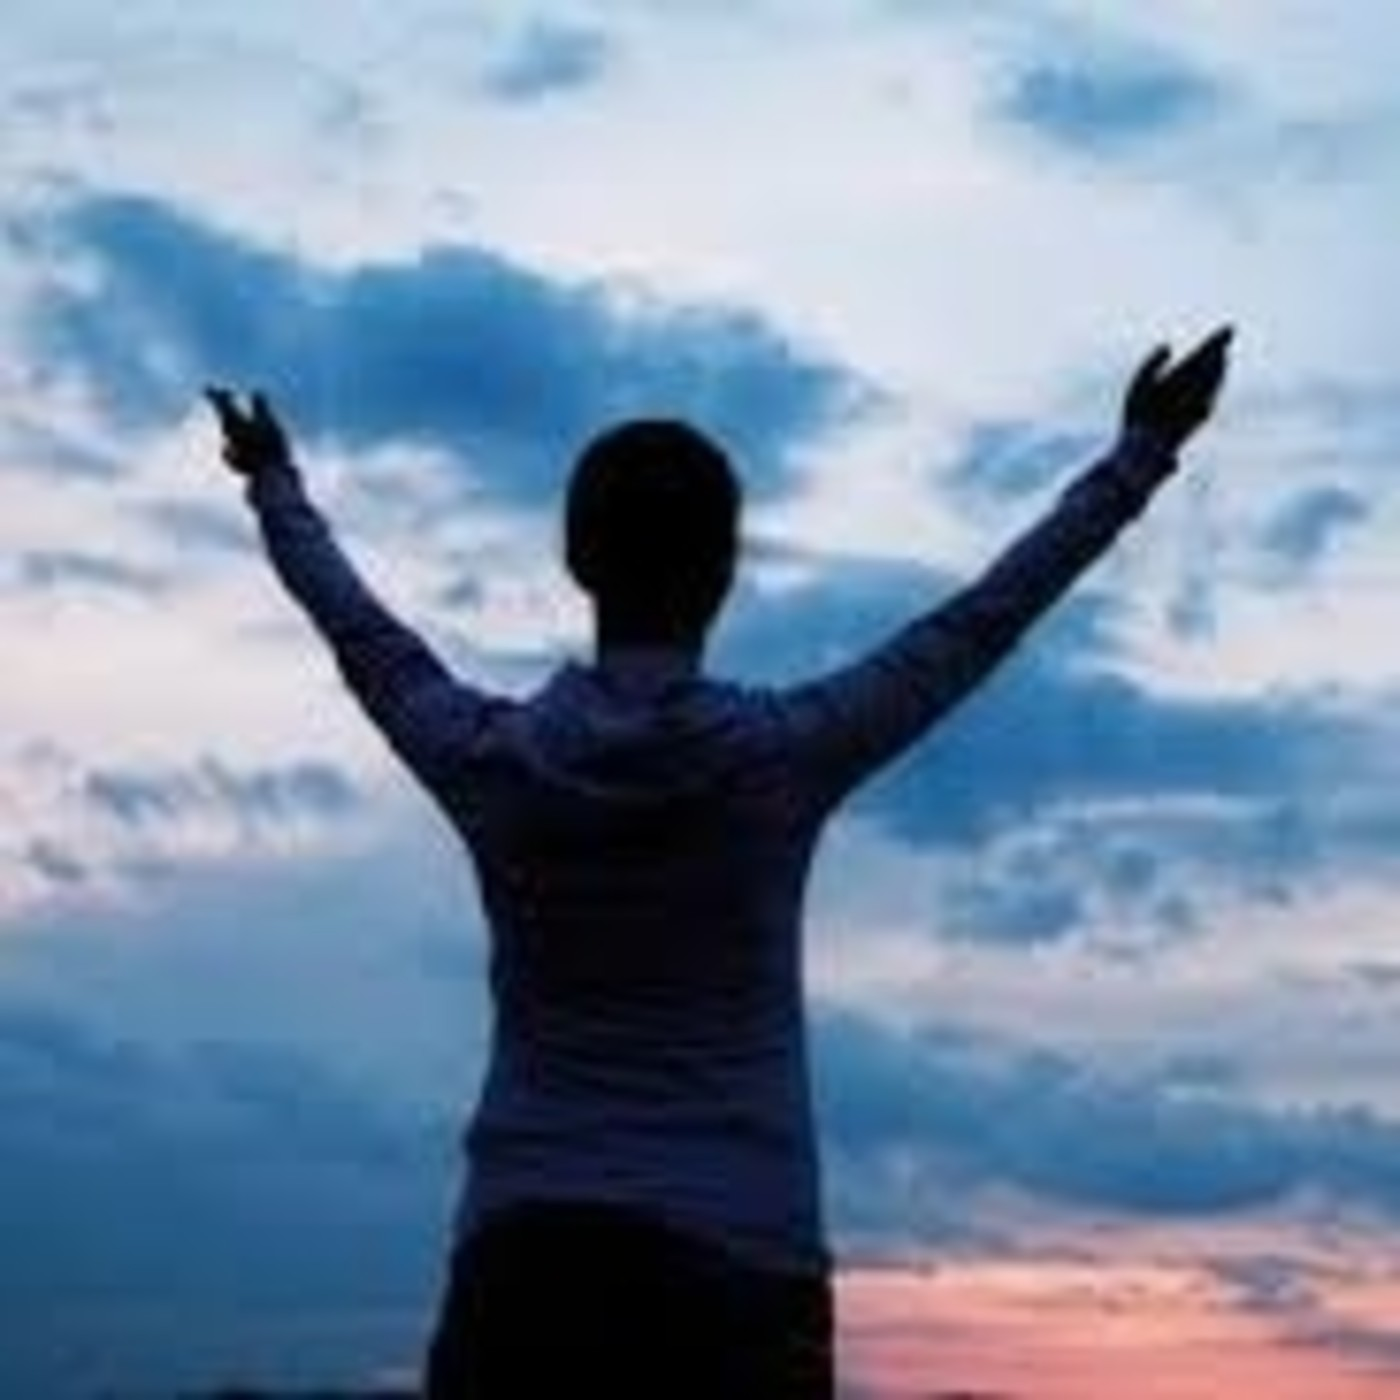 UNIDOS EN CRISTO: Bendecidos por Dios Efesios 1:3-14